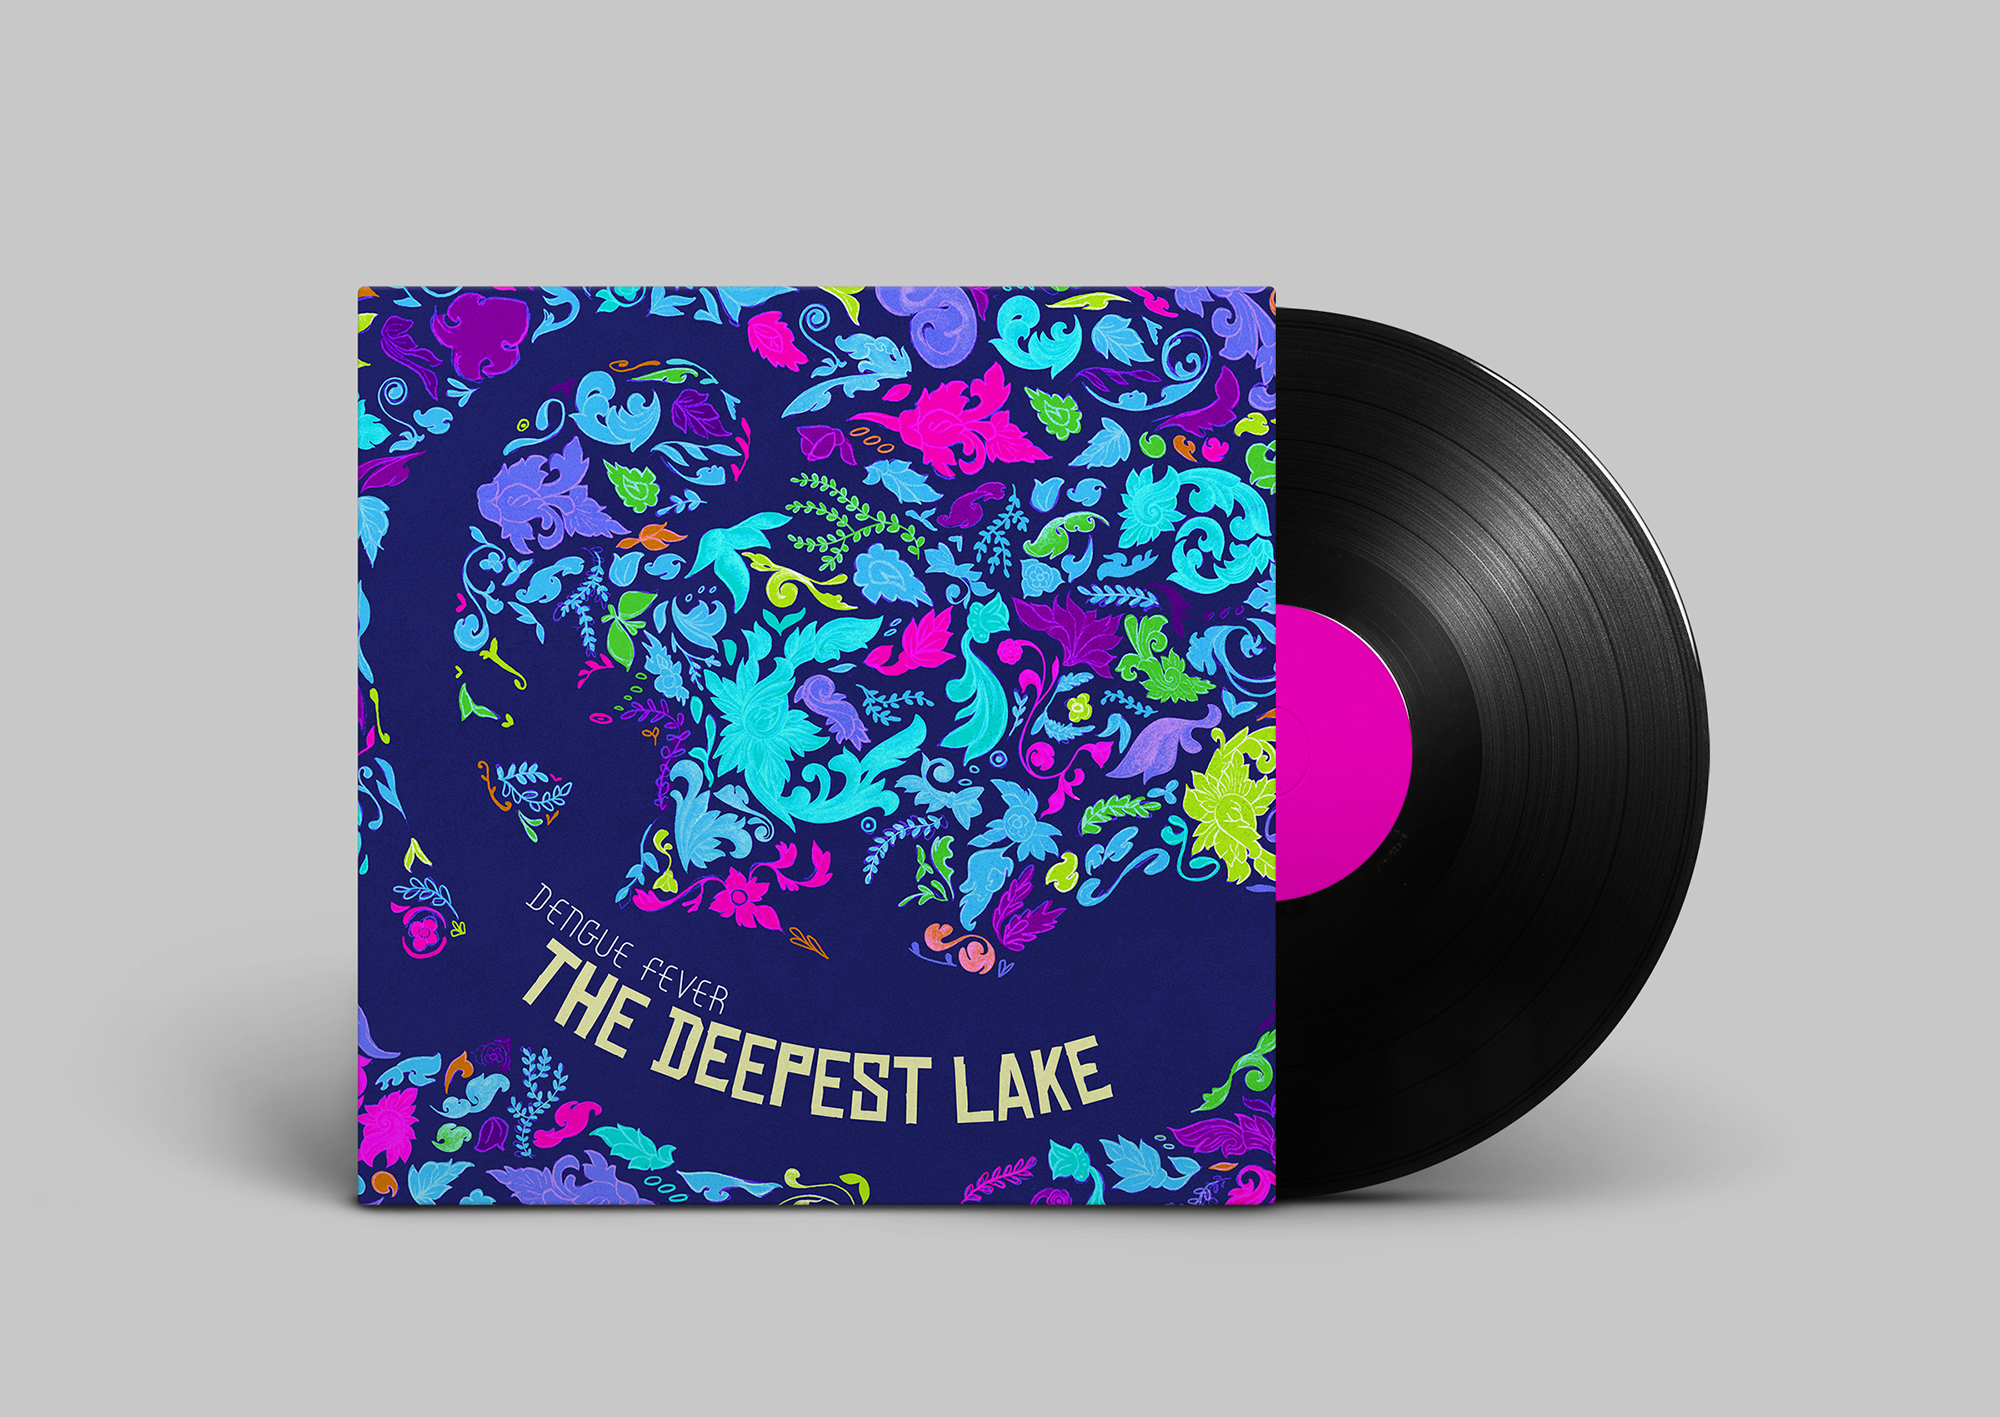 SR_Tang_The-Deepest-Lake_2-voxGraphis